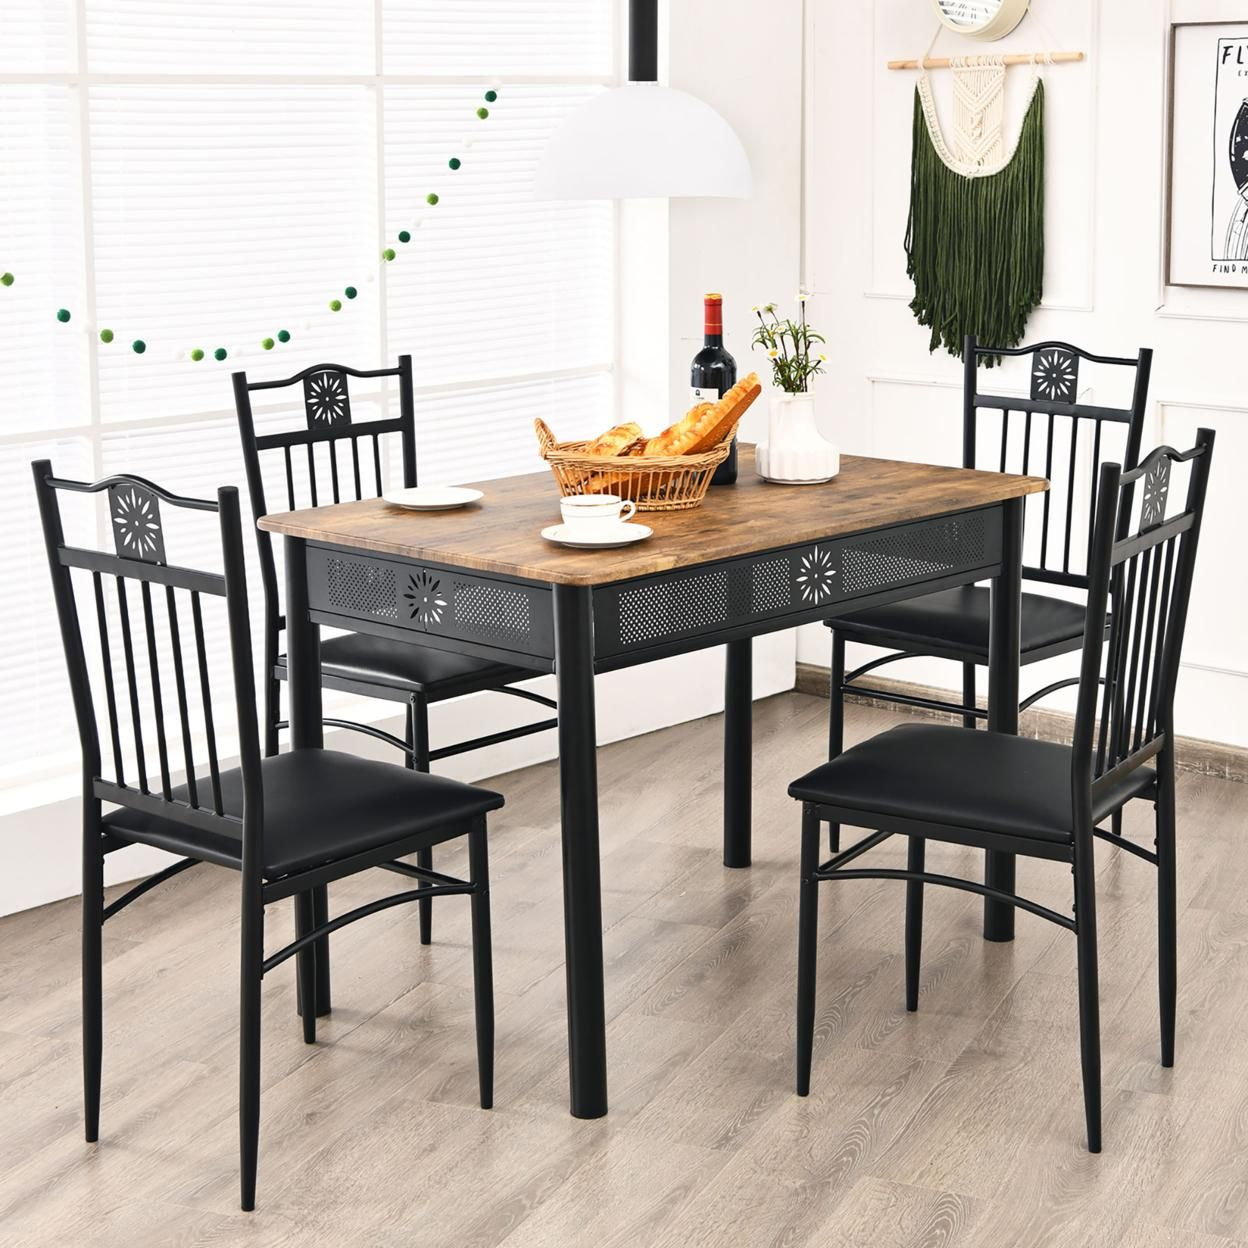 Costway 5PCS Dining Set Metal Table & 4 Chairs Kitchen Breakfast Furniture Black